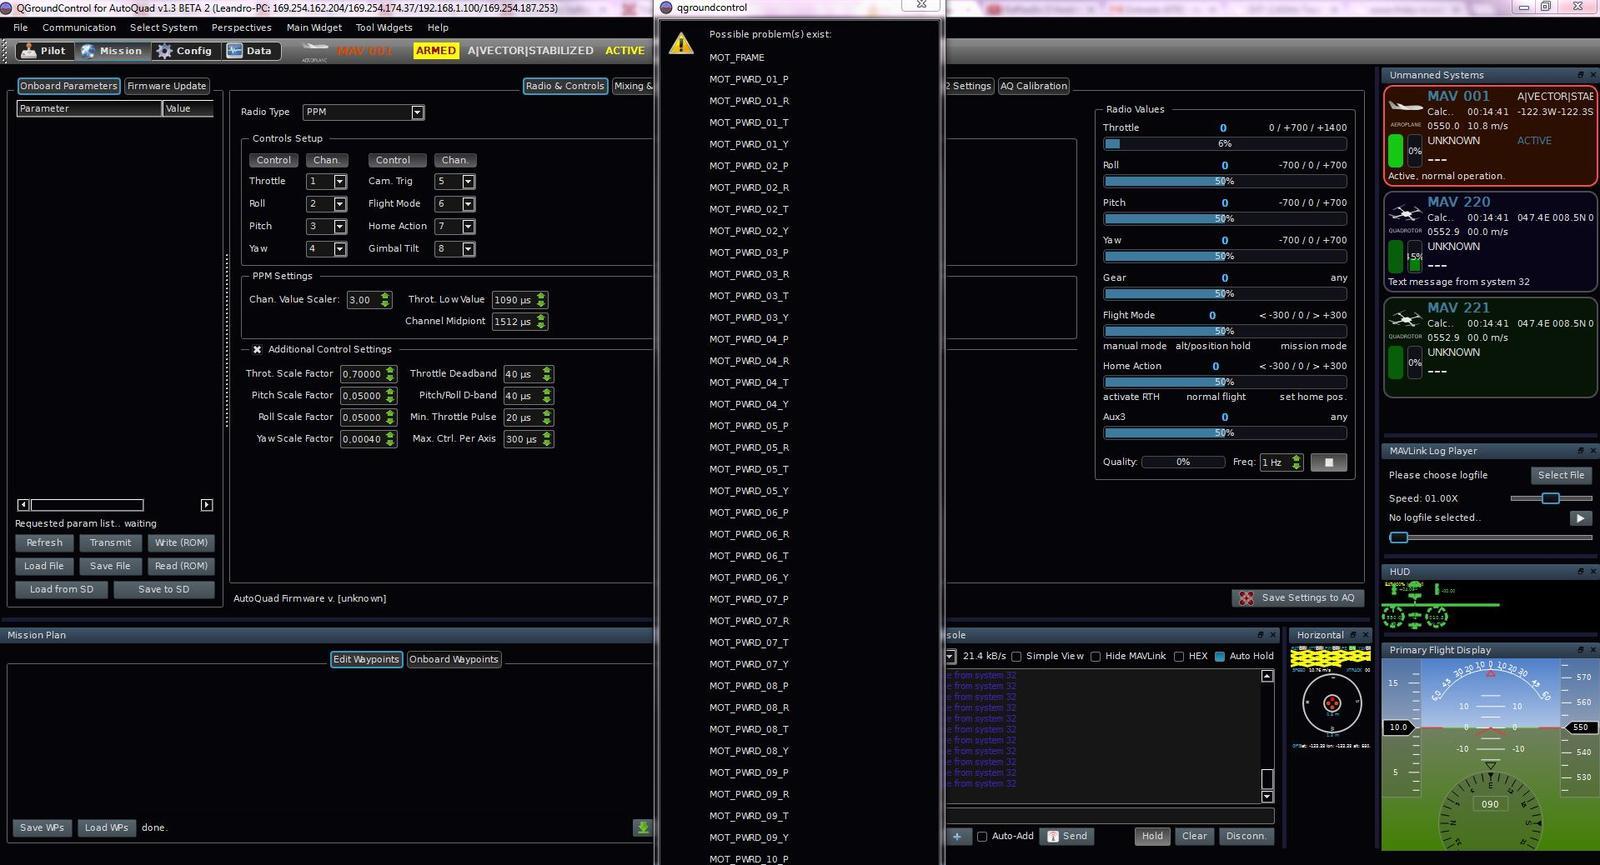 Attachment browser: 2013-07-08 16_04_09-QGroundControl for AutoQuad